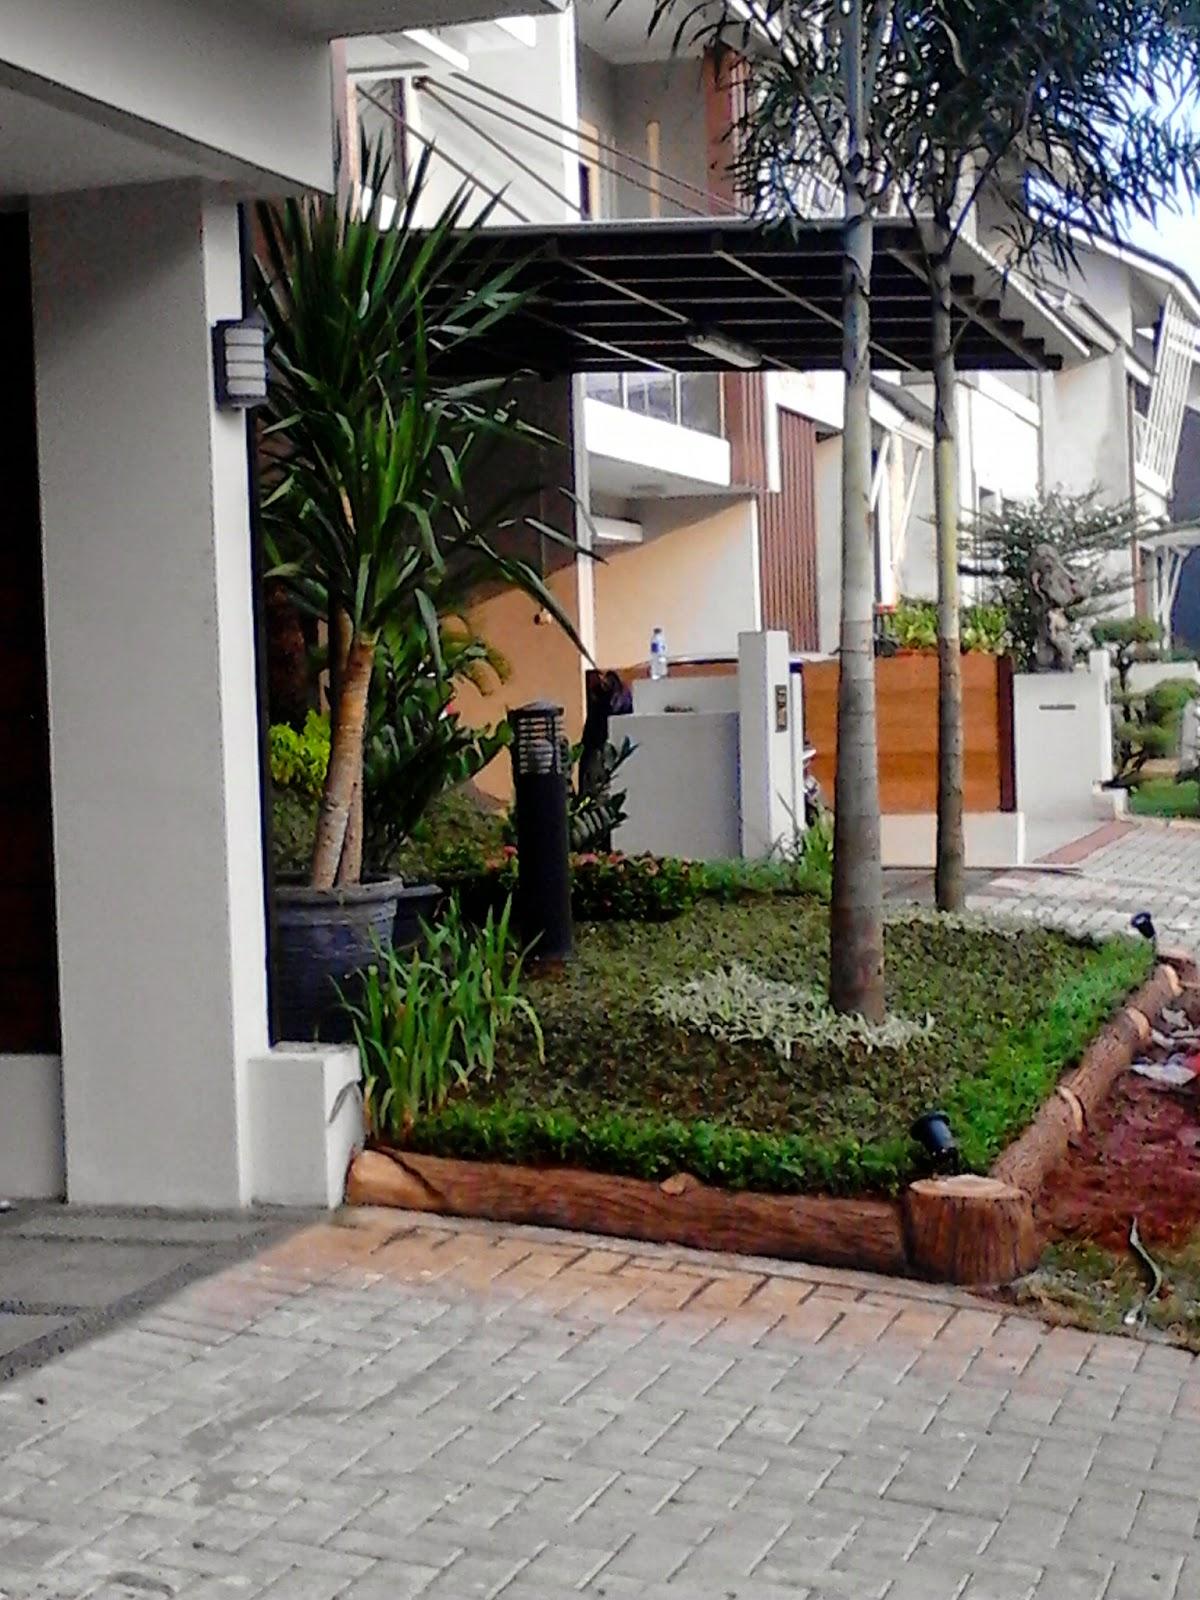 Jasa Tukang Taman Dibogor | Tukang Taman Minimalis Bogor | Tukang Taman Murah